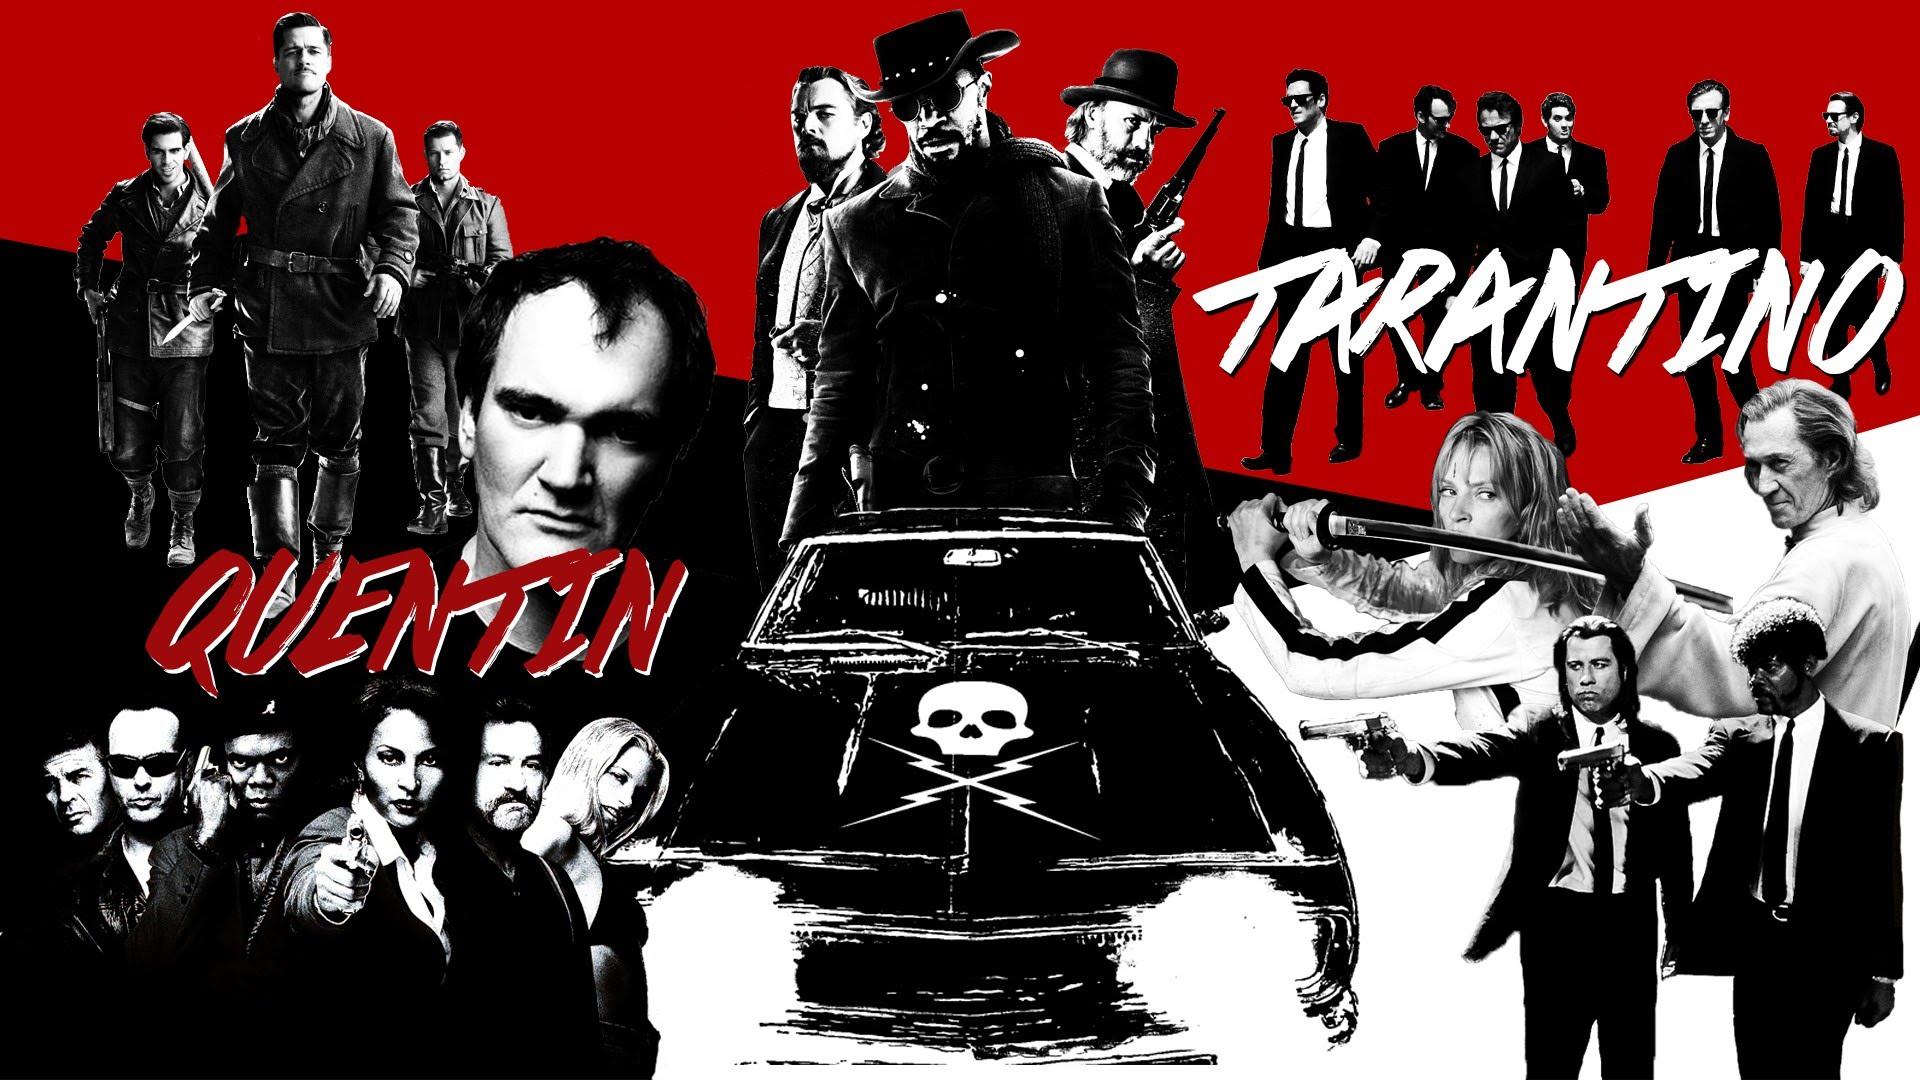 Filmes Tarantino